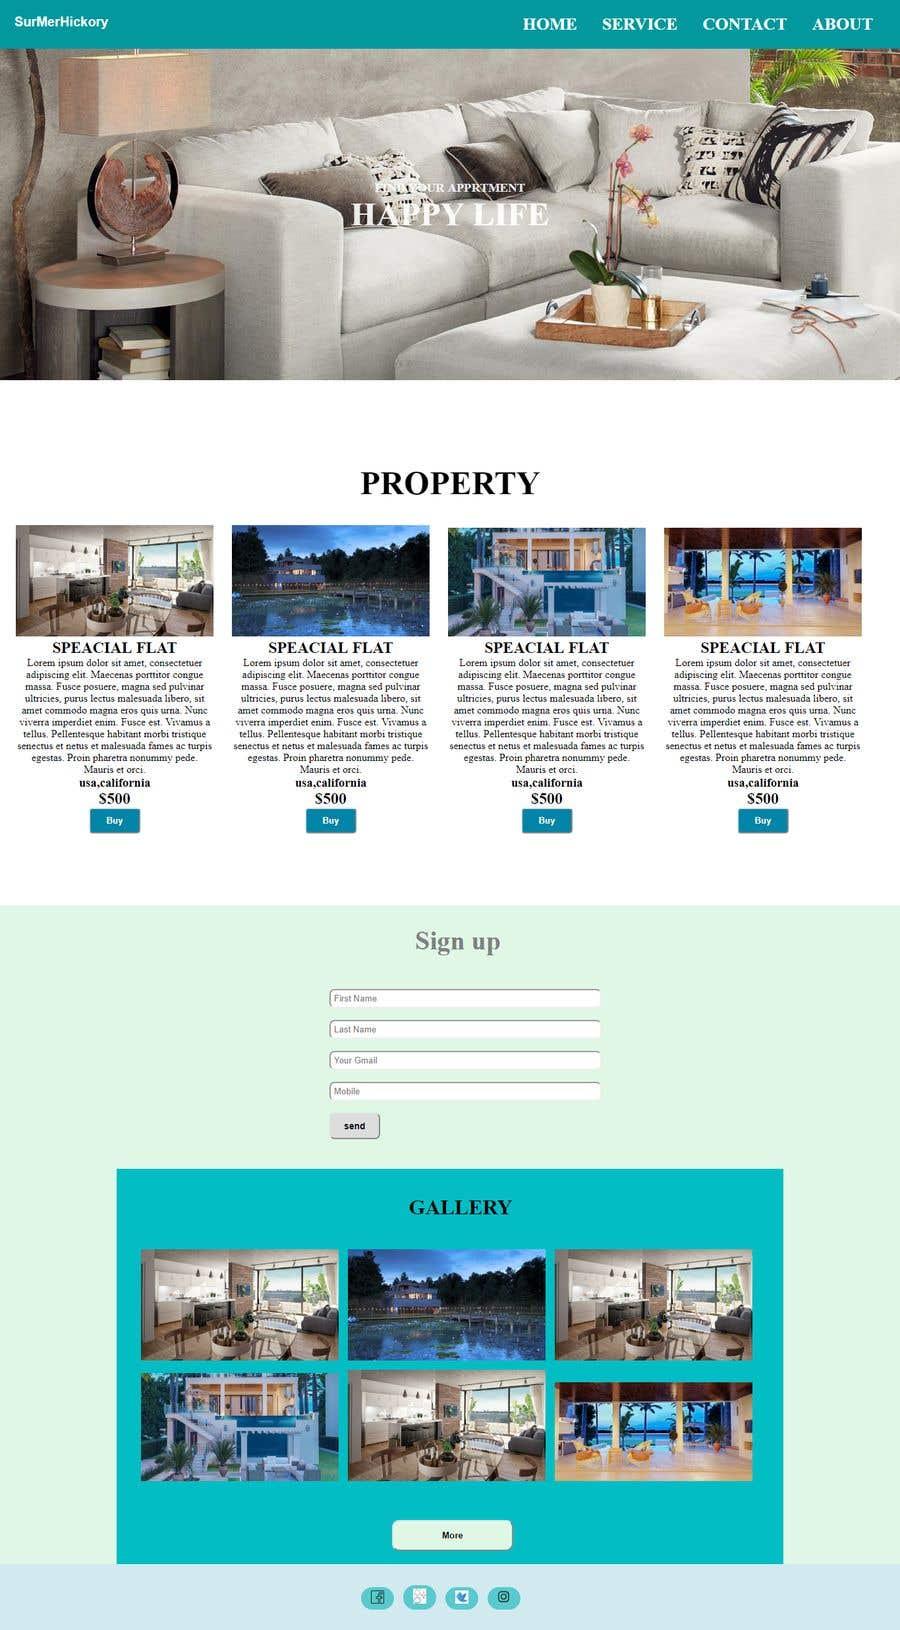 Penyertaan Peraduan #12 untuk Website Design & Layout - 2 Page Design